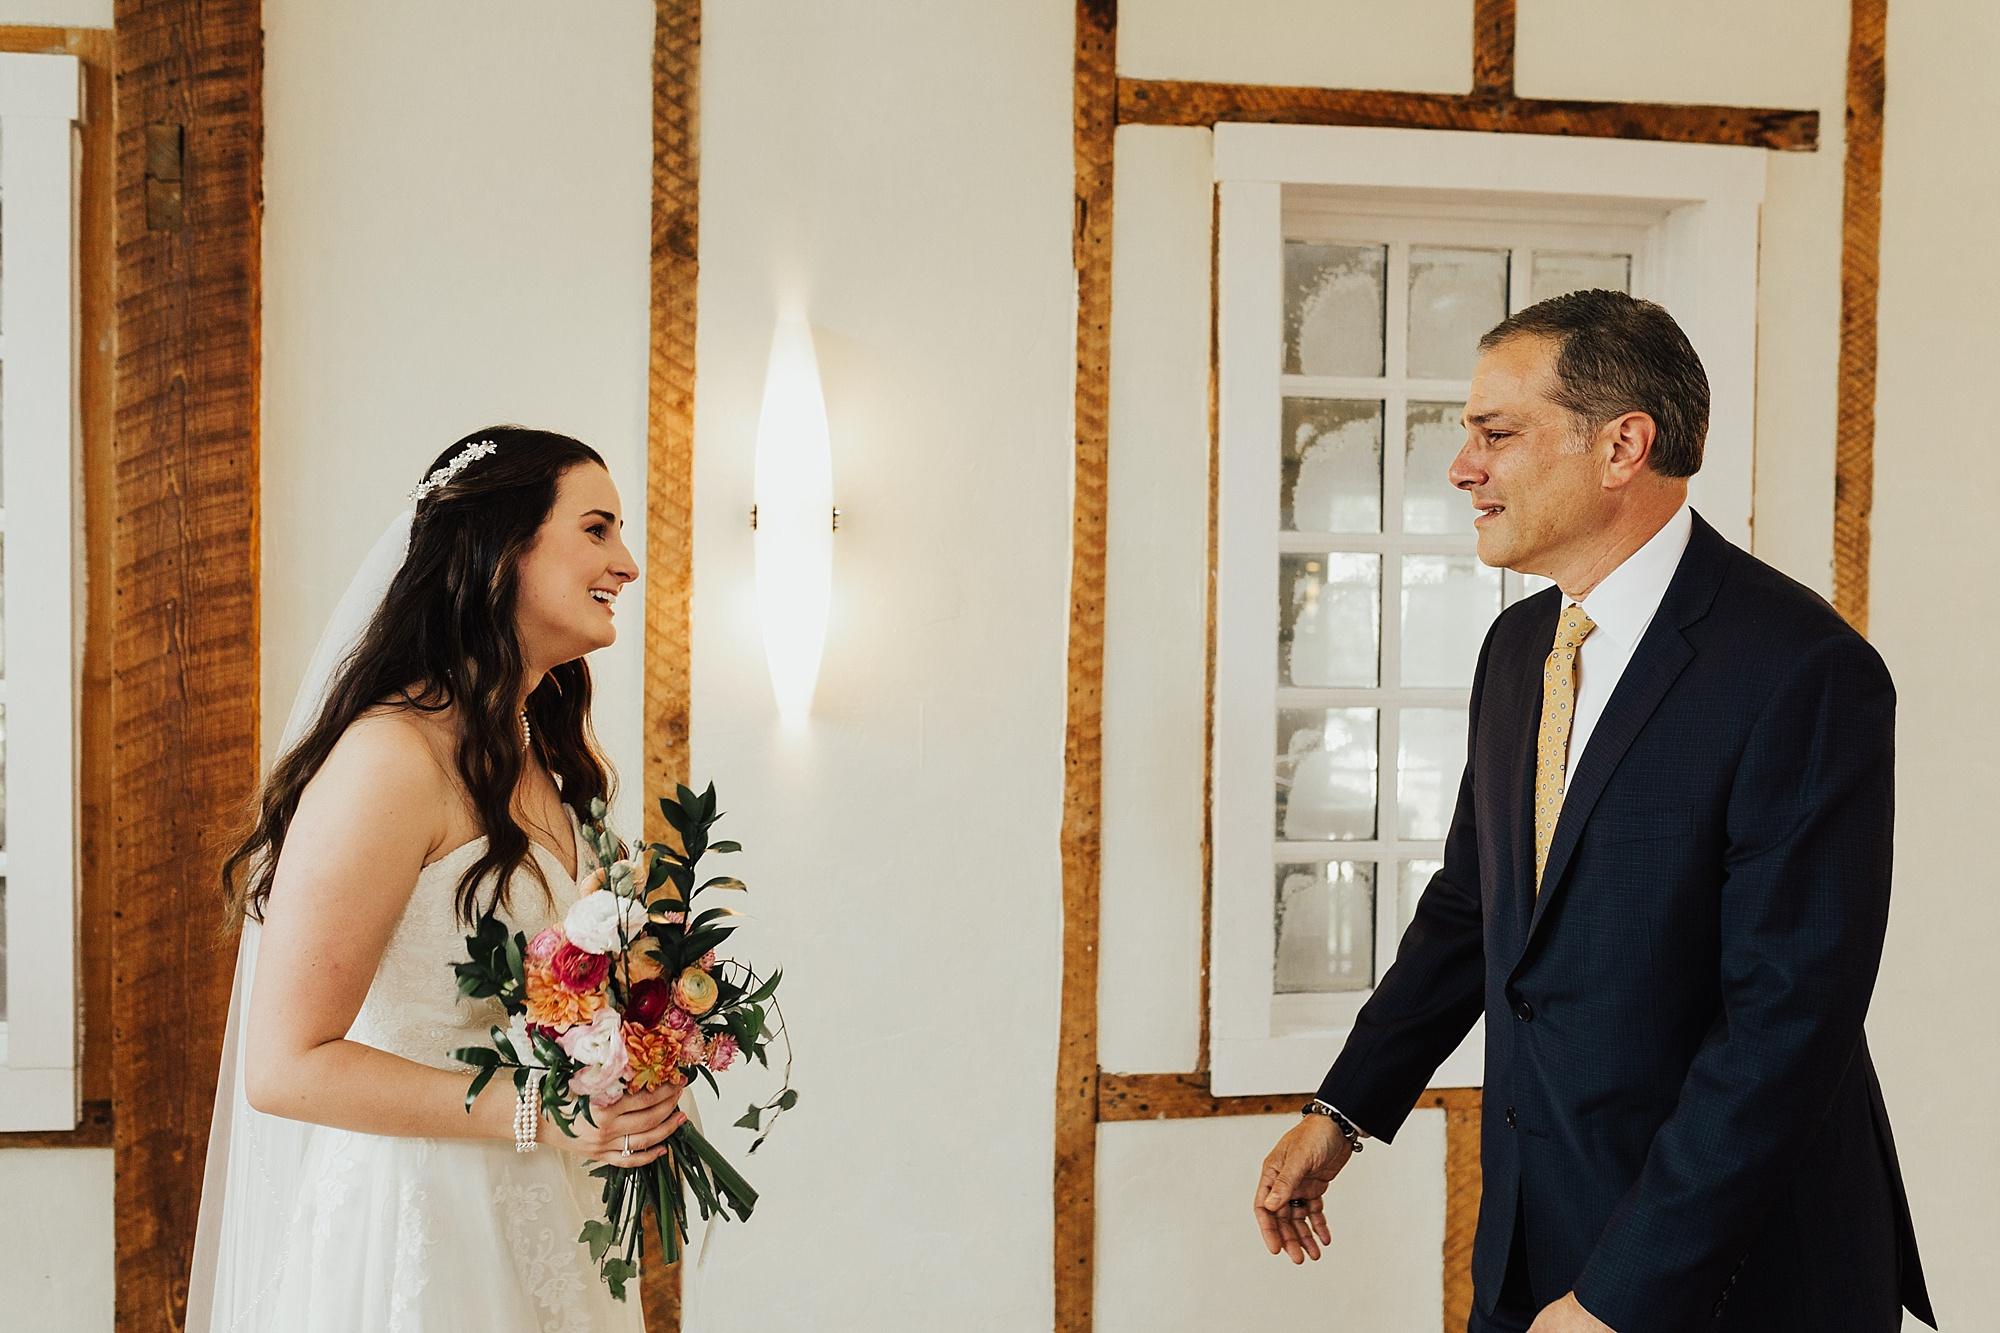 Love_by_Joe_Mac_Nicole_Patrick_Gables_At_Chadds_Ford_Wedding_Photography_Best_Philadelphia__0031.jpg